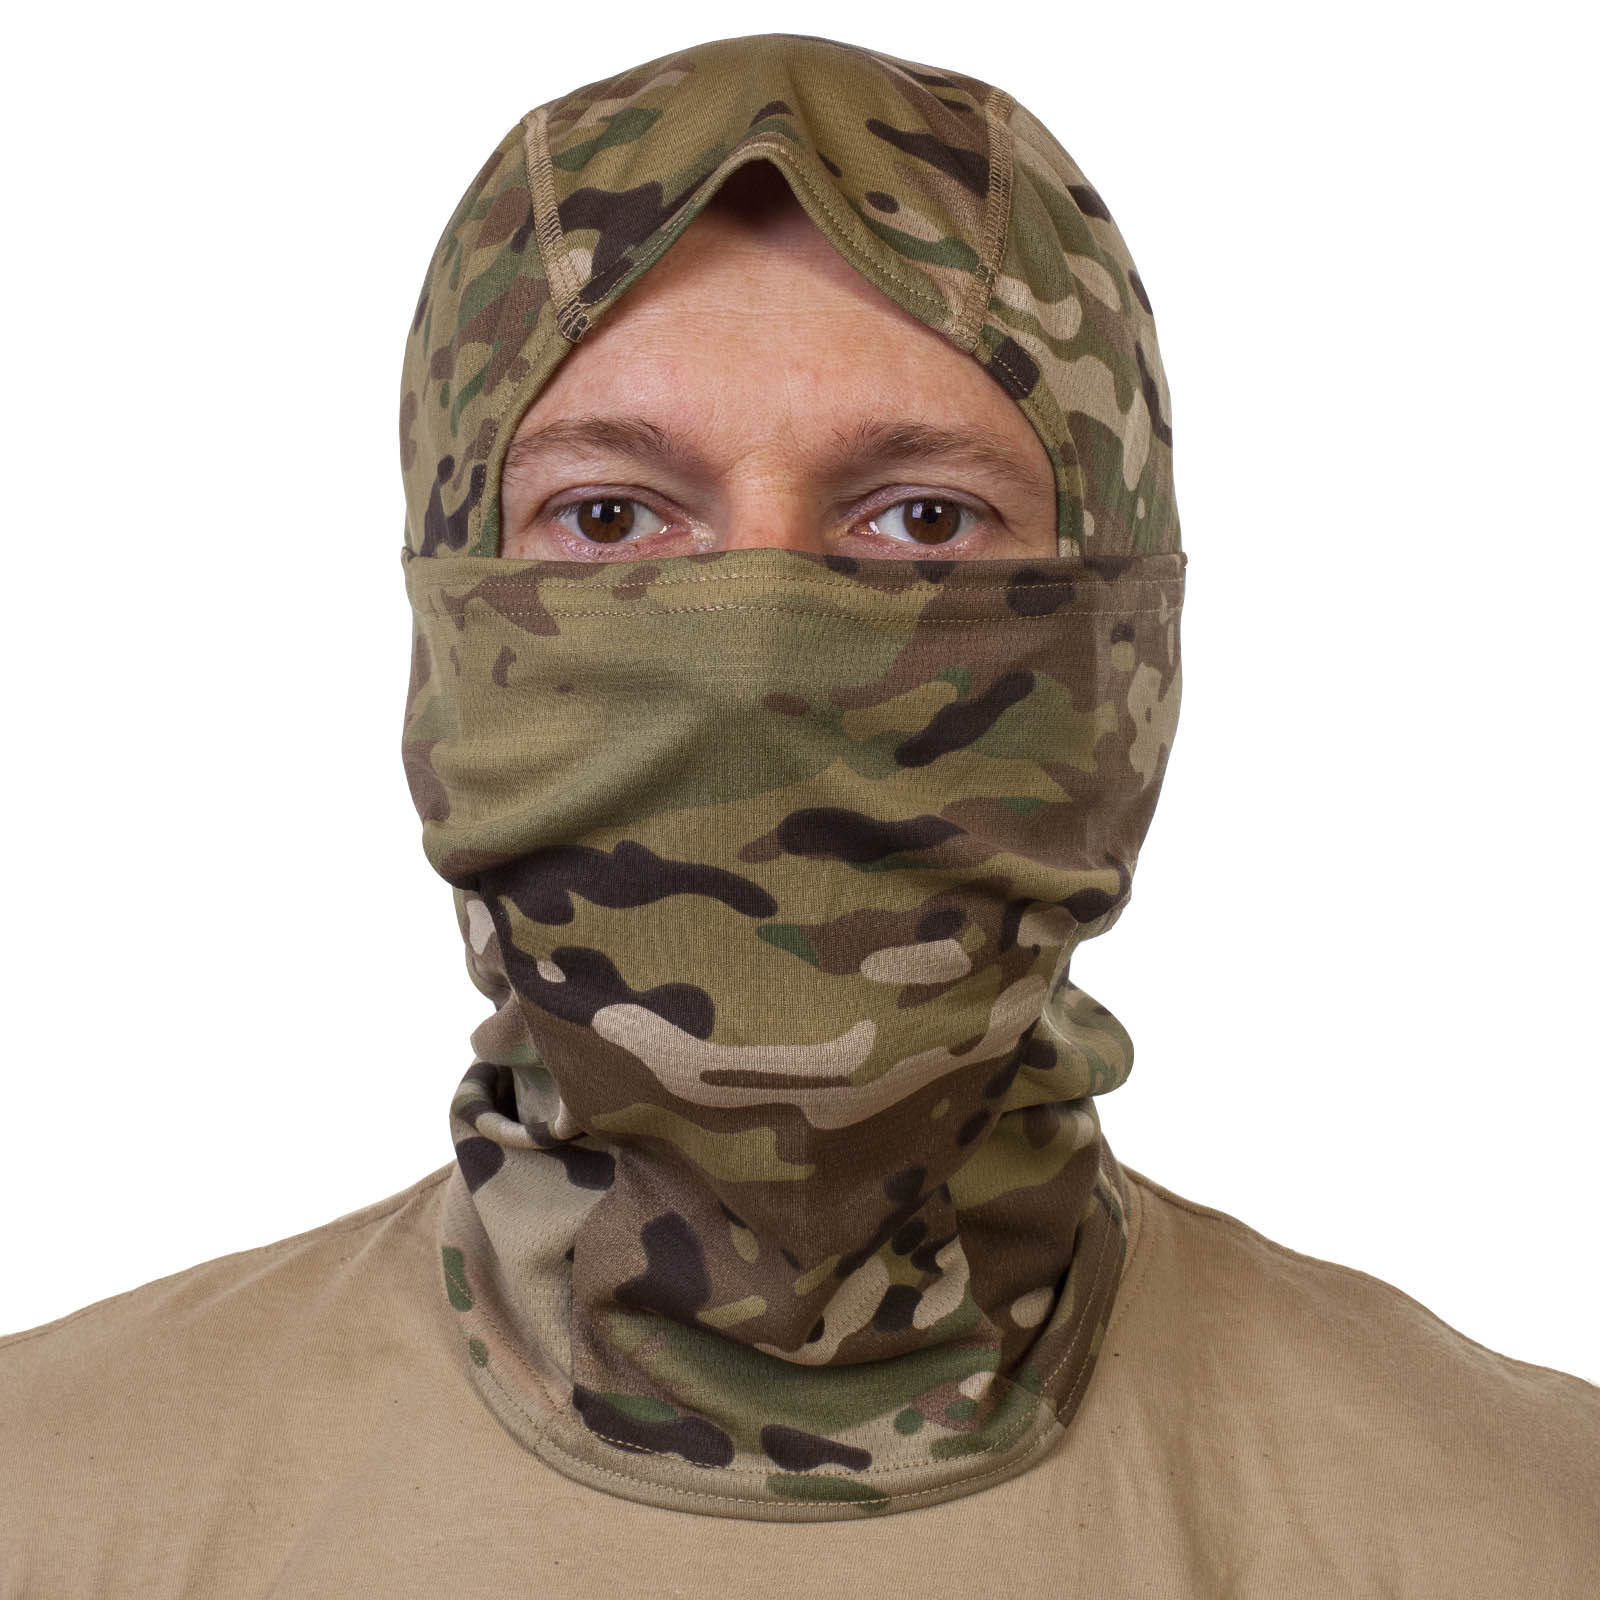 Армейская маска балаклава, маскировочный паттерн «Амёба».